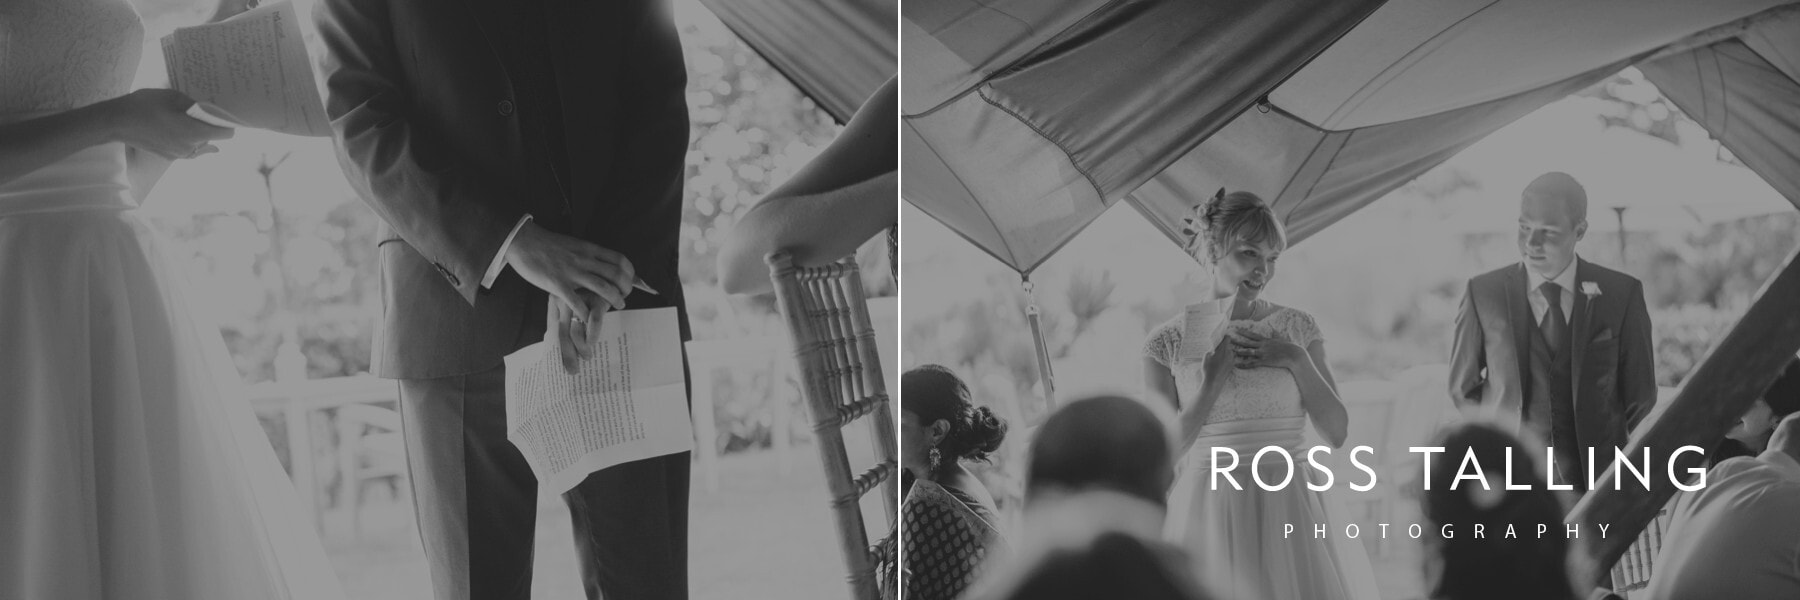 laura-matts-rosevine-hotel-wedding-photography-cornwall_0157